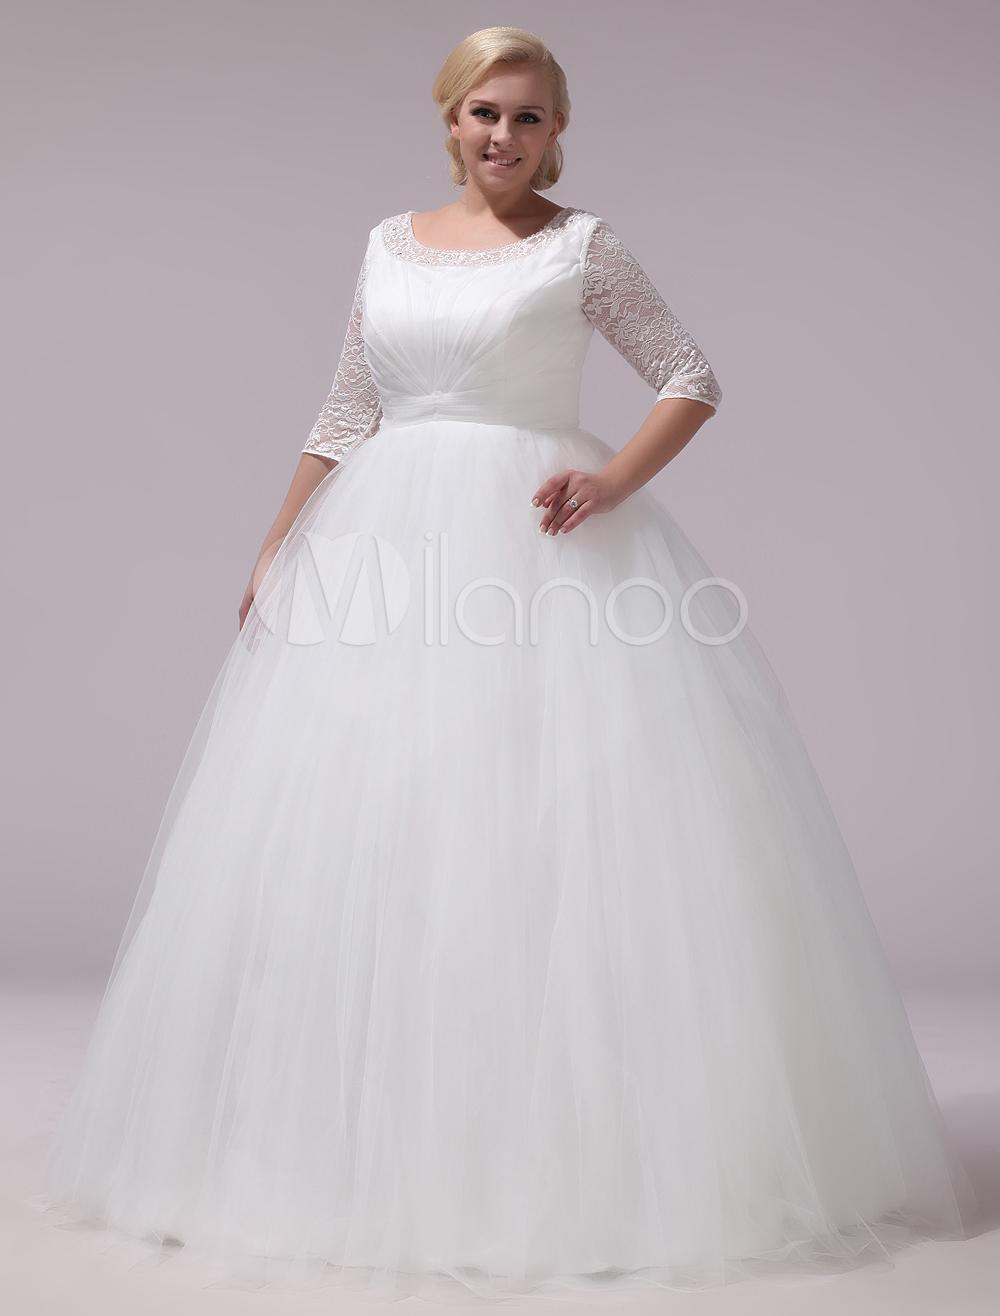 robe de mari e grandes tailles robe de mari e grandes tailles pas cher robe de mari e femme. Black Bedroom Furniture Sets. Home Design Ideas